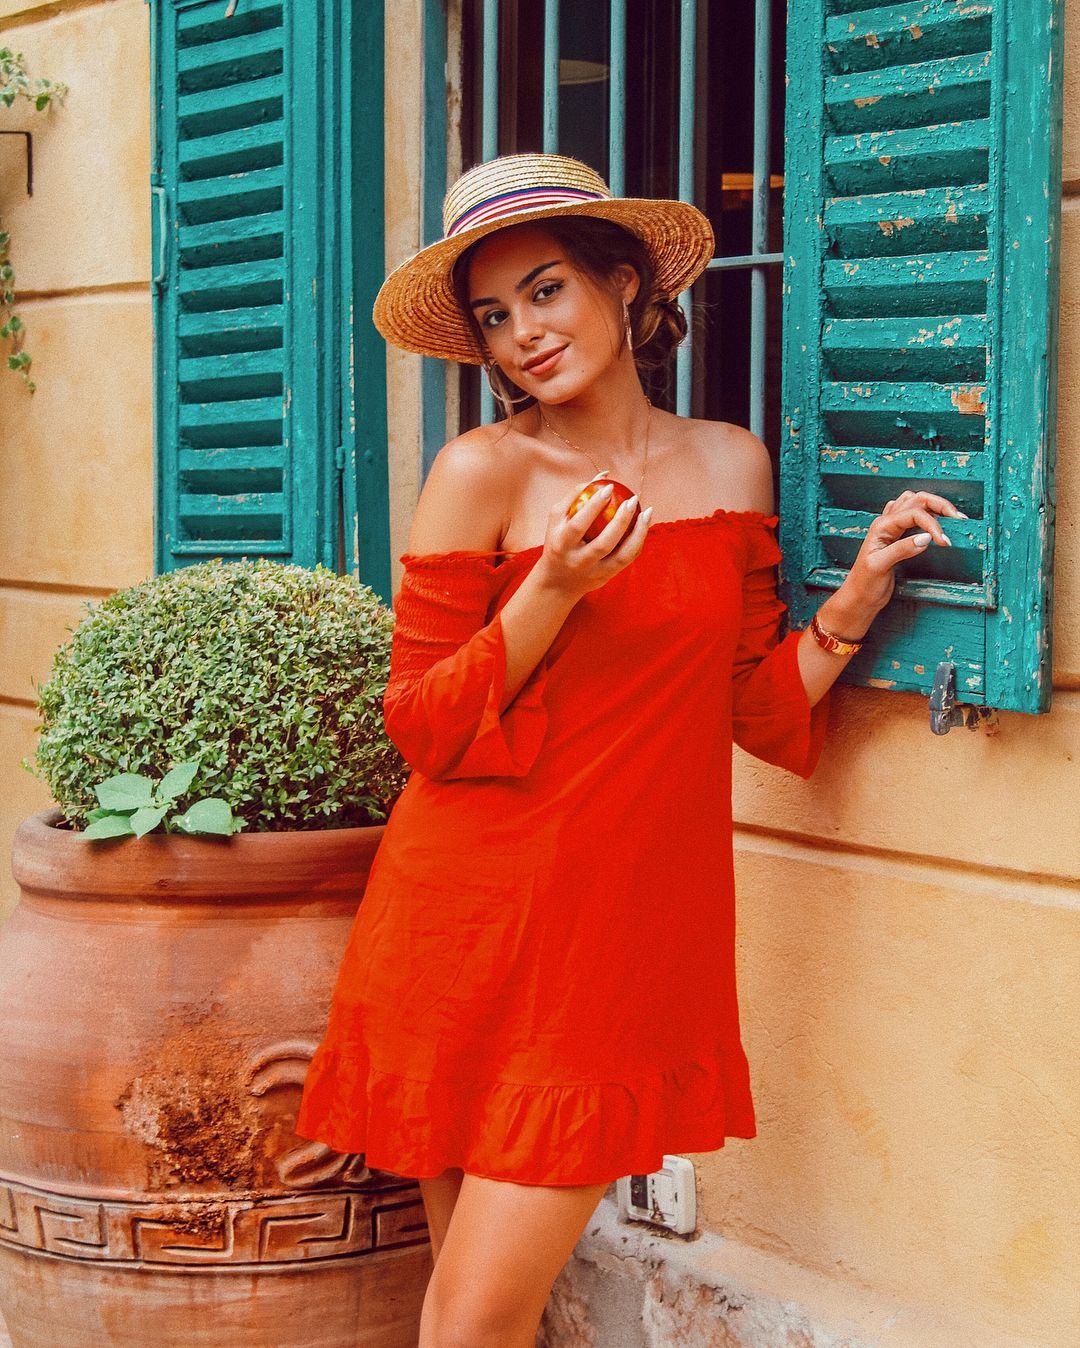 Summer Verona Nude Photos 30